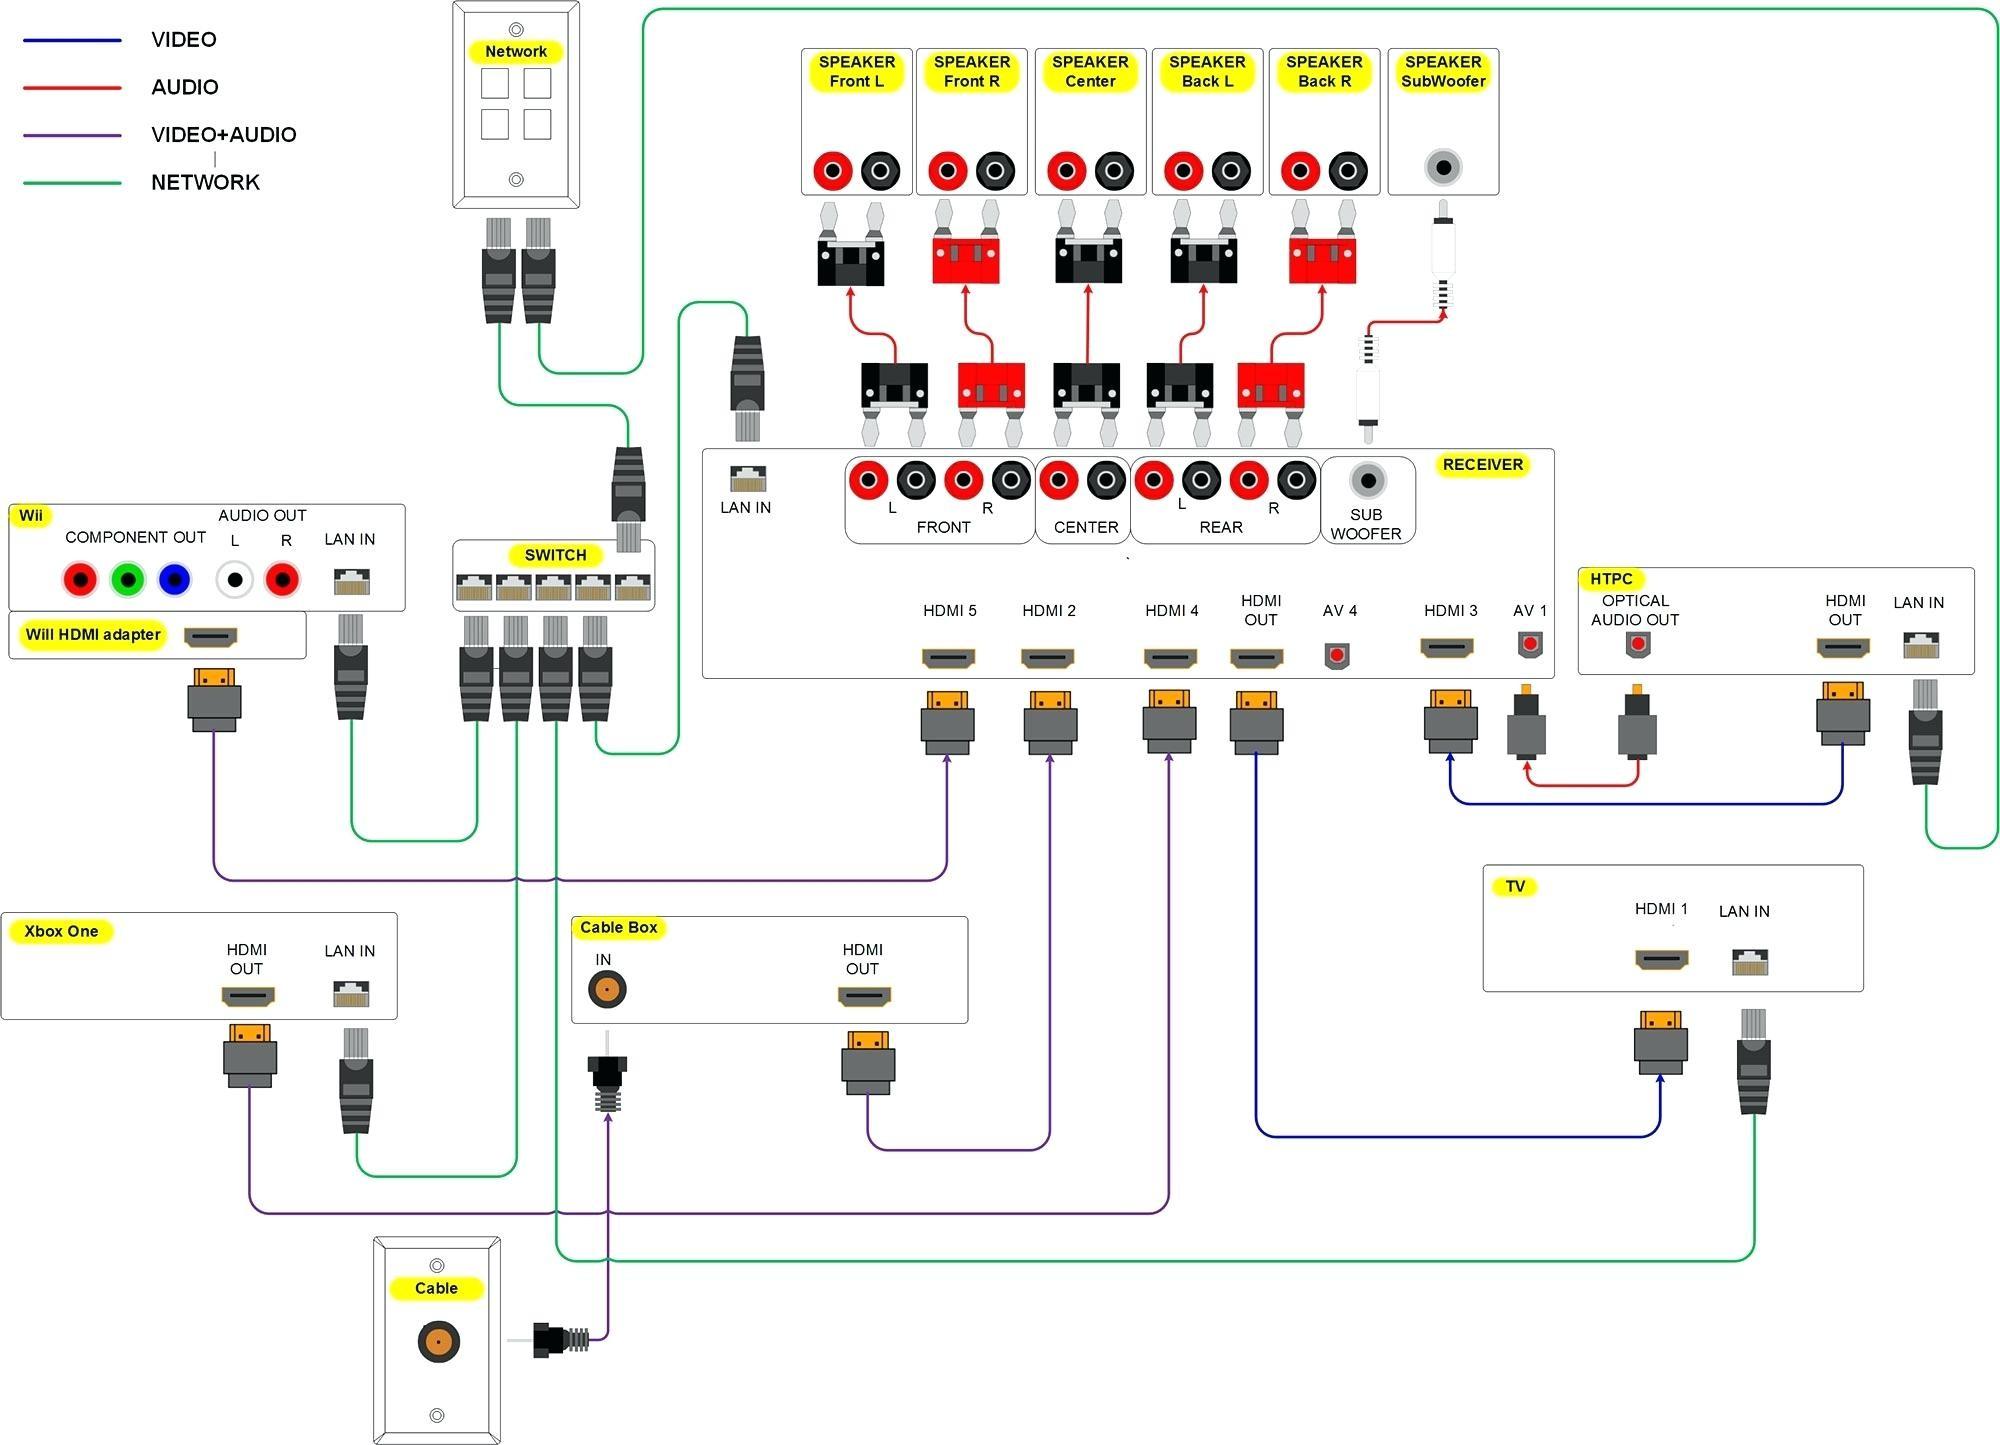 Home Speaker Diagram Schematic Diagrams Bi Wiring Speakers Guide U2022 Systems